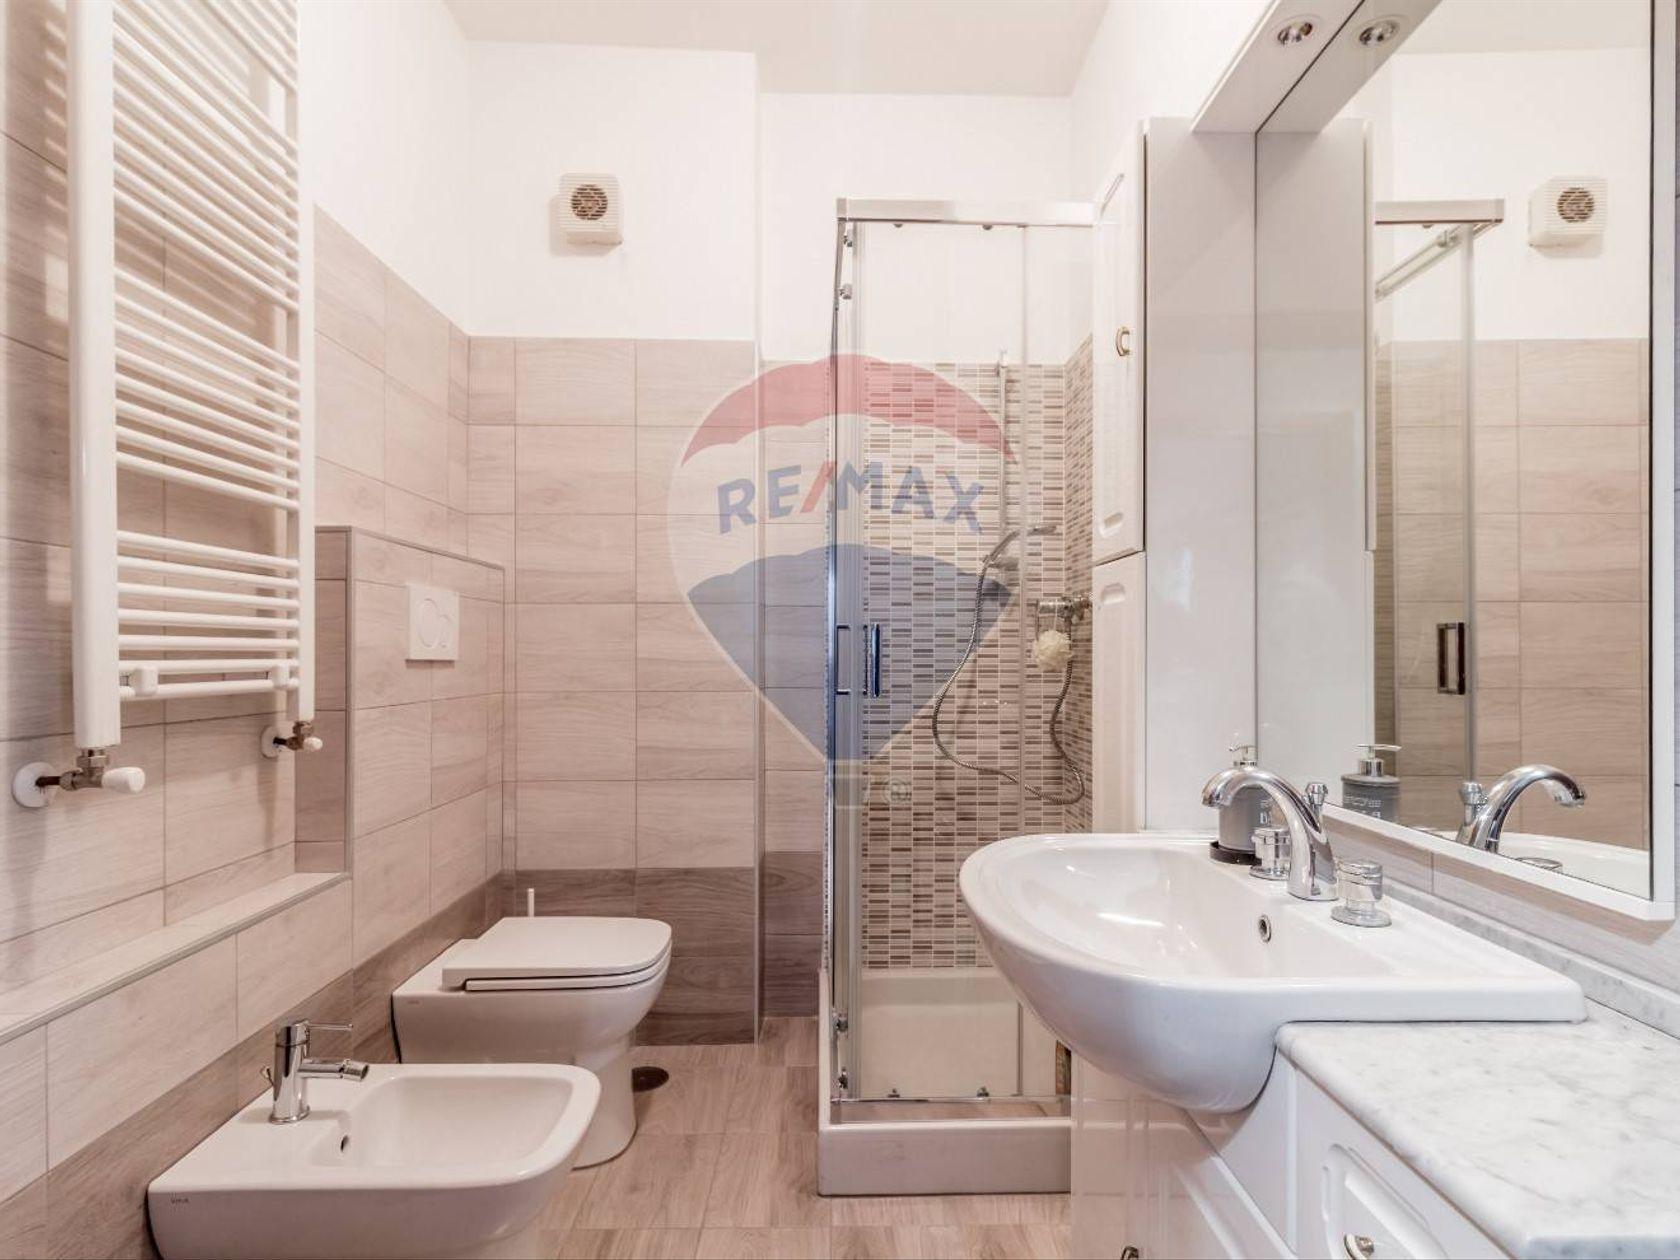 Appartamento Villa Adriana, Tivoli, RM Vendita - Foto 17